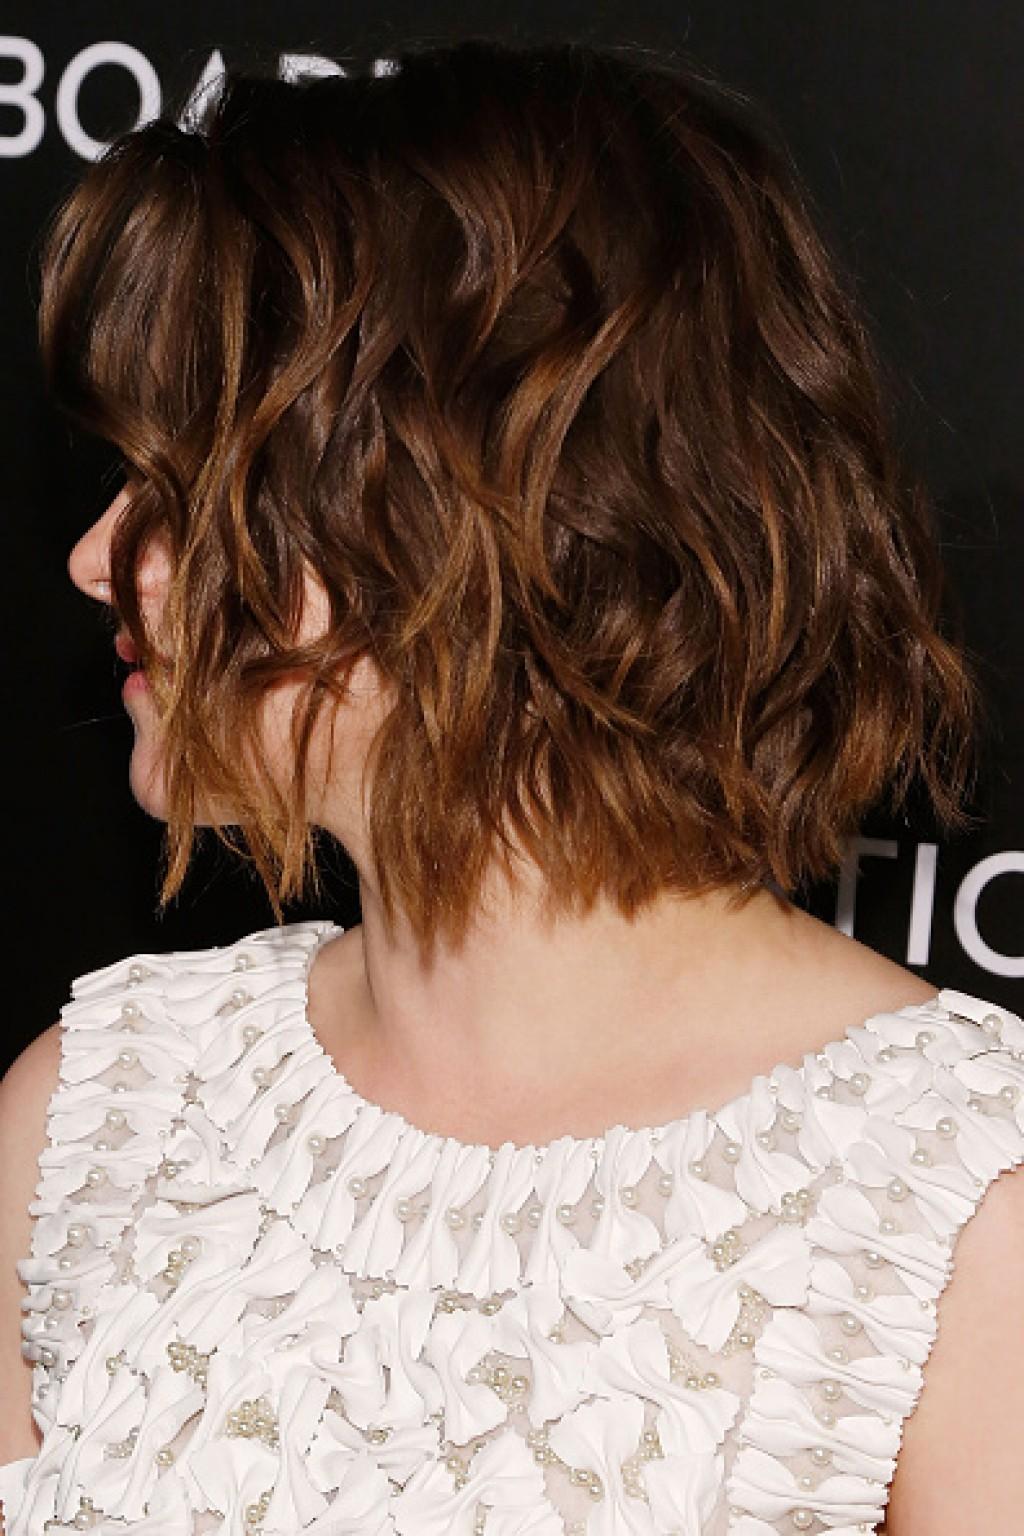 Kristen-Steward-2016-National-Board-of-Review-Gala-Make-up-Hair-1024x1536